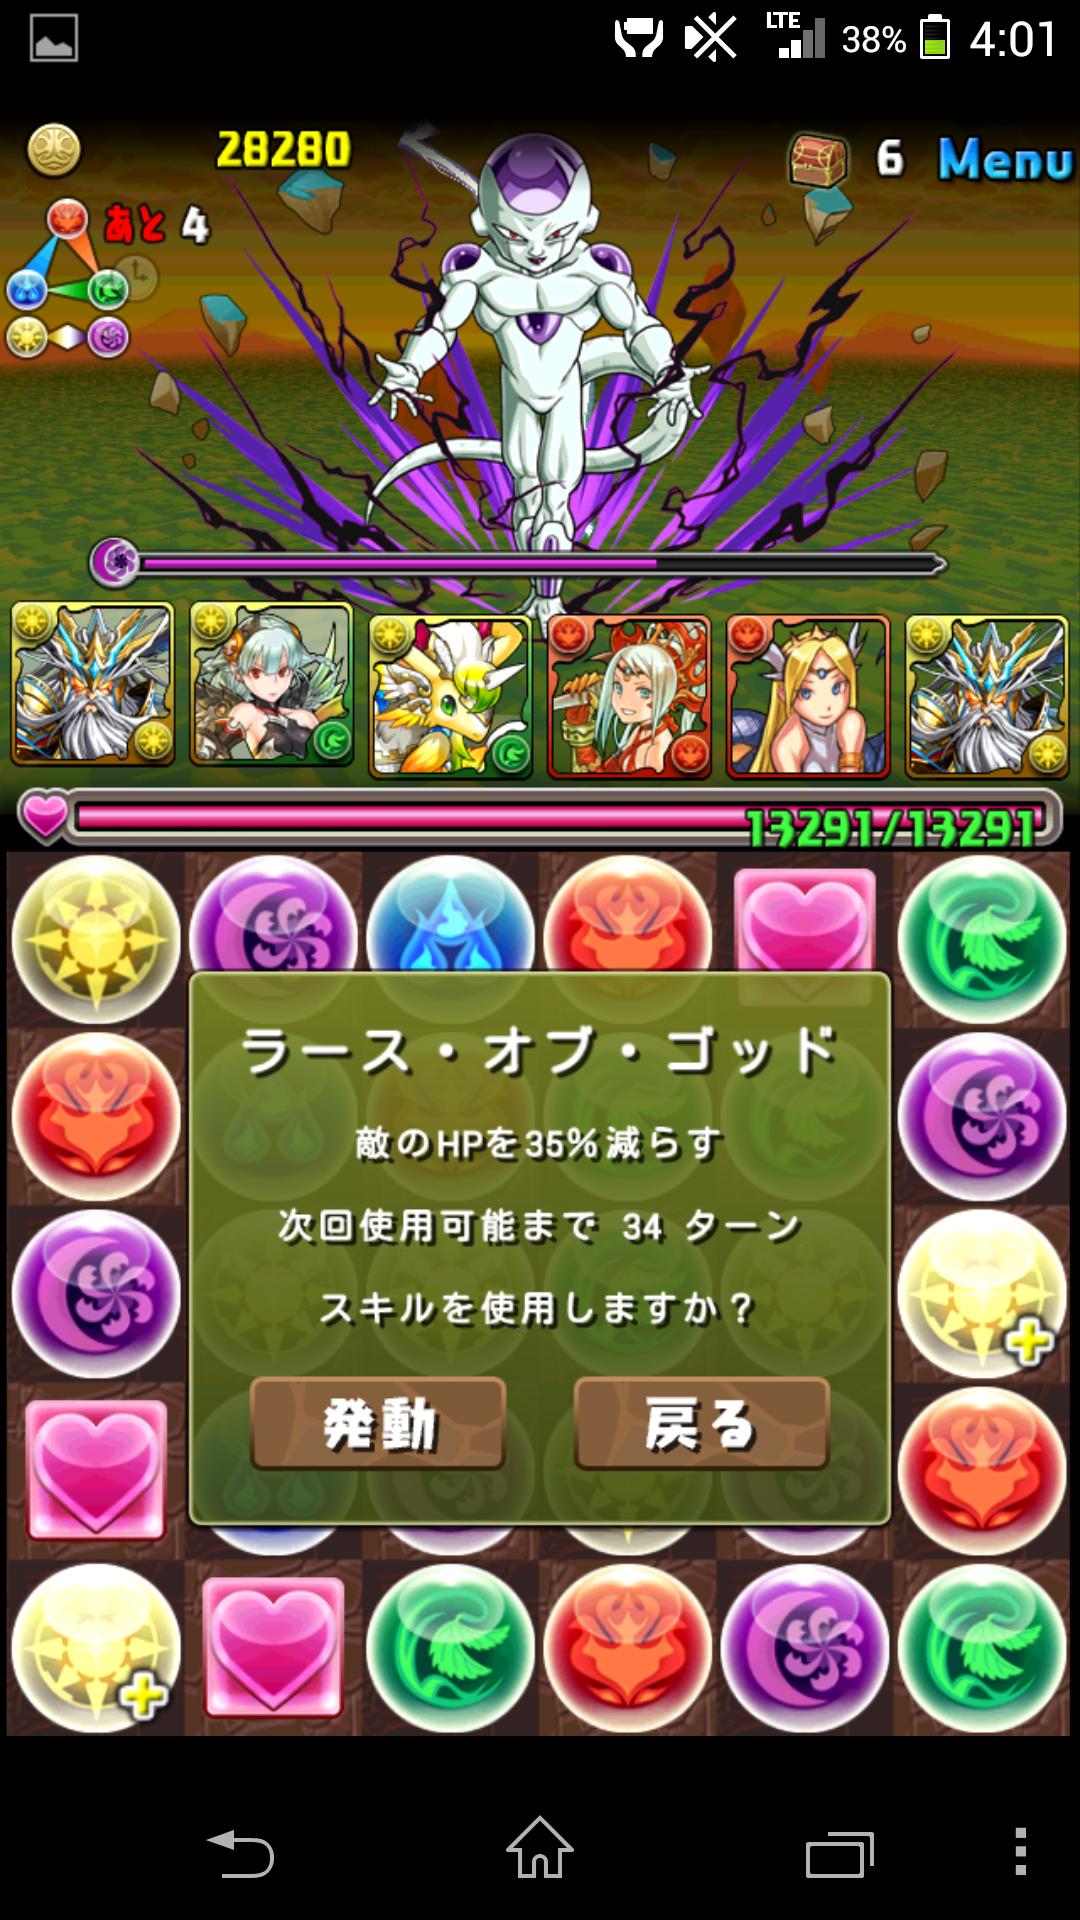 Screenshot_2014-06-06-04-01-22.png